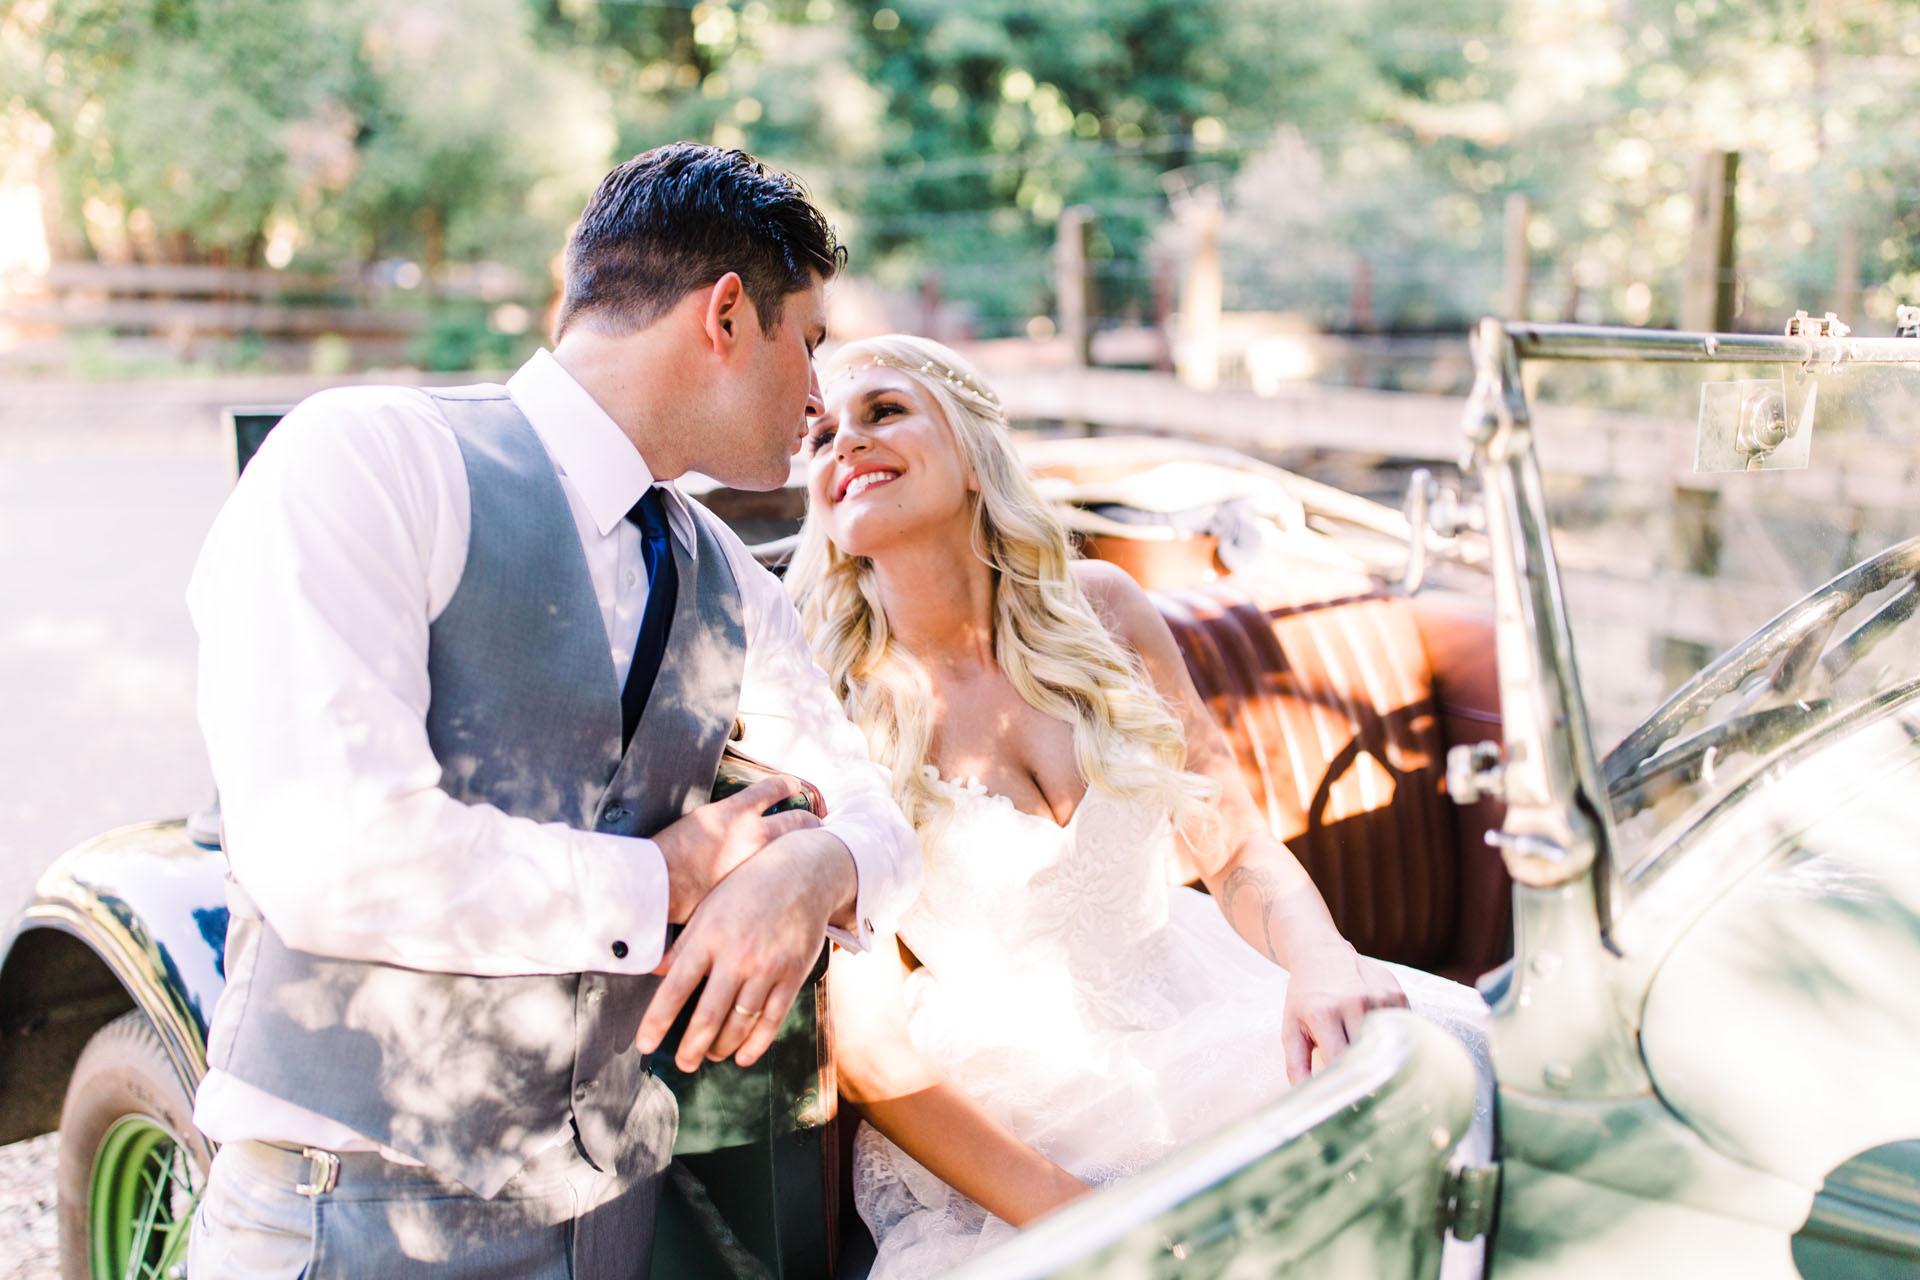 10-7-17 Devon and Jordan's Wedding-120.jpg